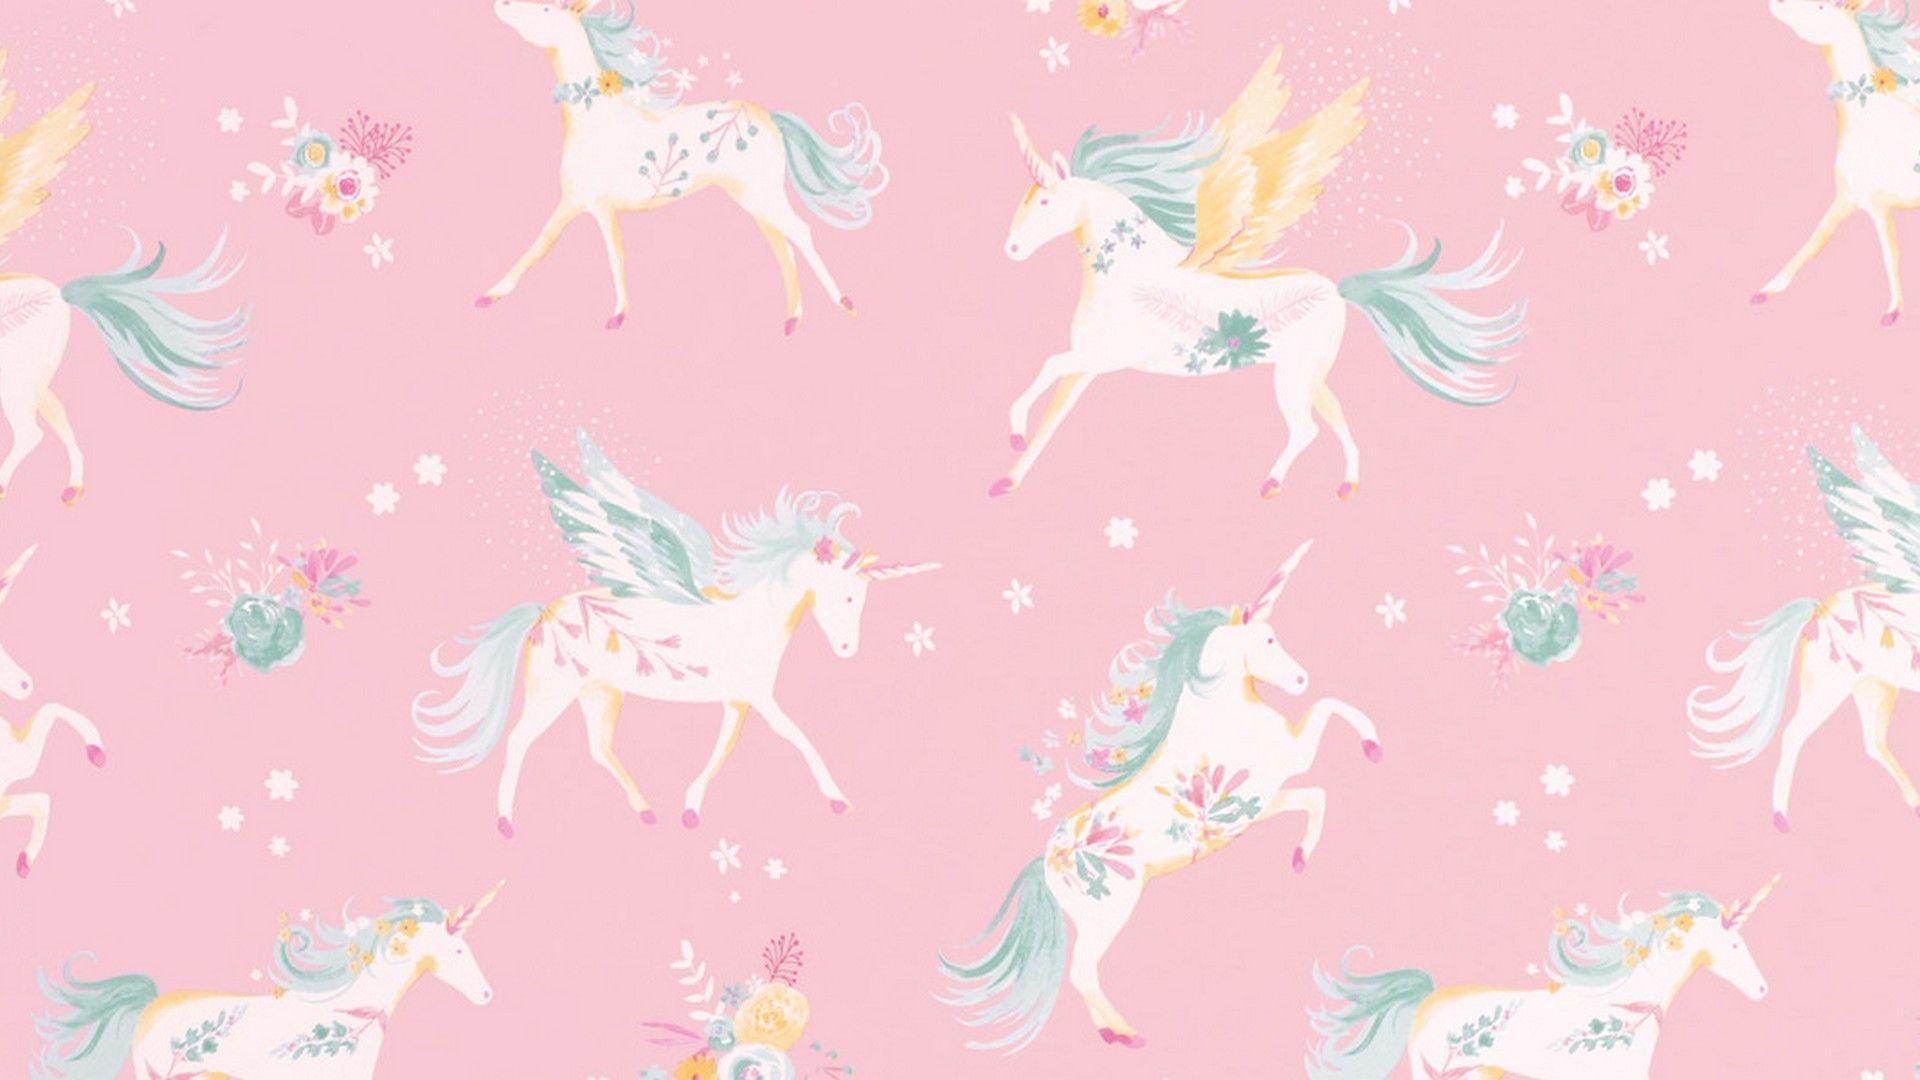 Wallpaper Hd Cute Unicorn 2021 Live Wallpaper Hd Cute Unicorn Unicorn Wallpaper Wallpaper